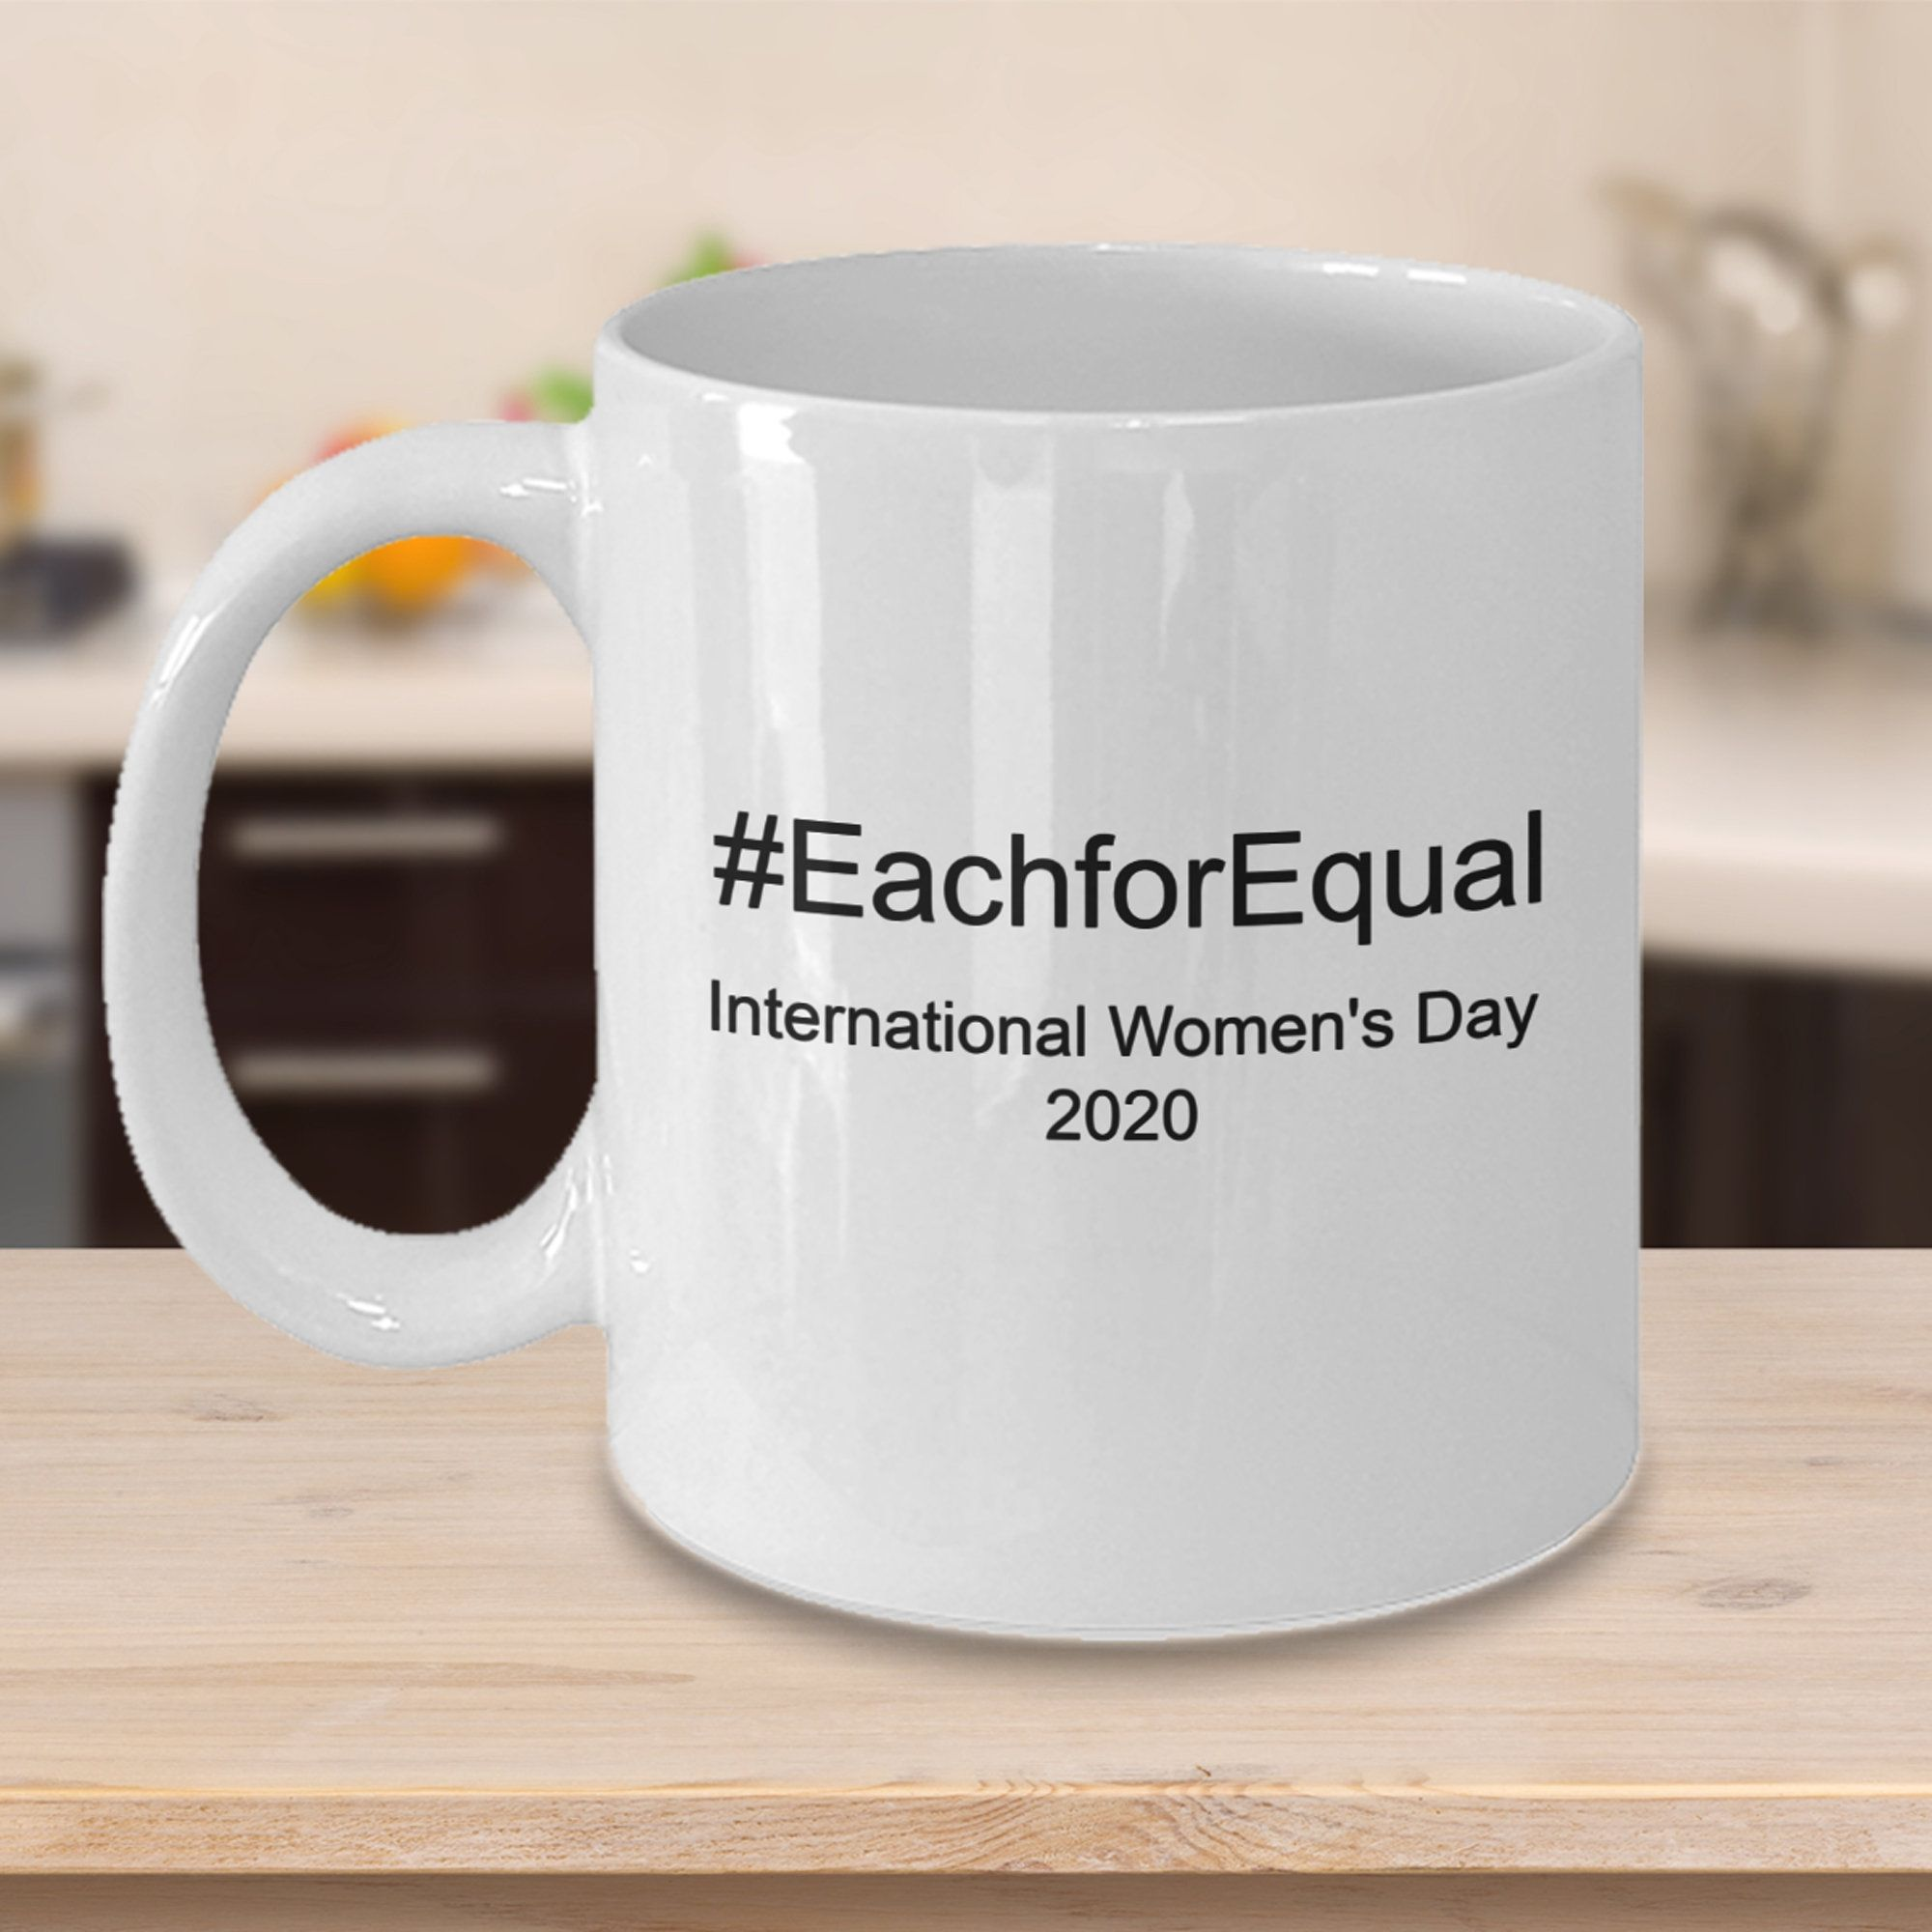 International Women's Day Coffee Mug, EachforEqual Theme